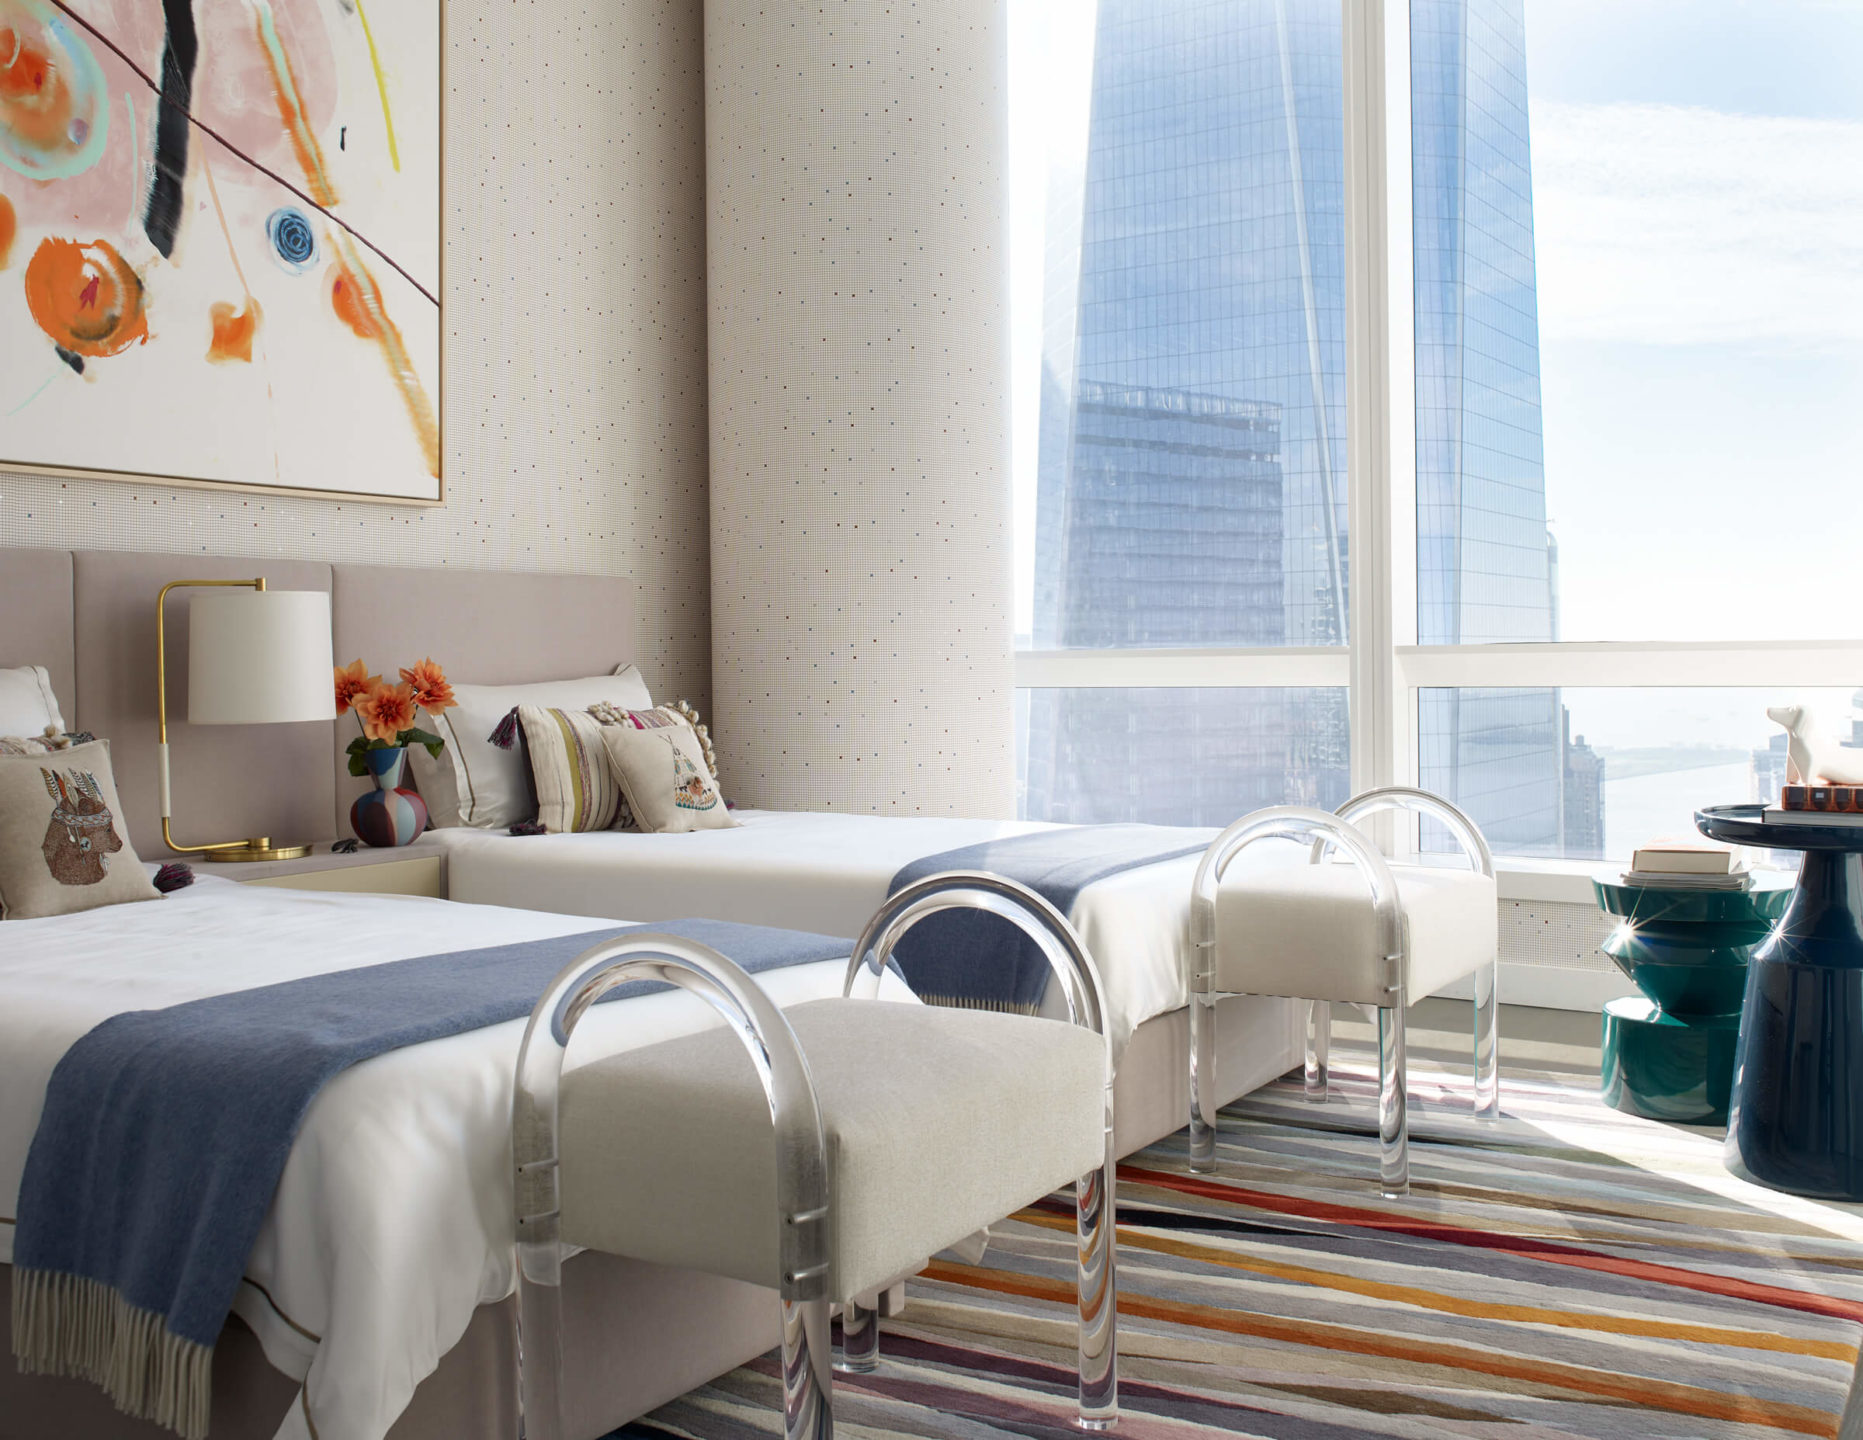 nicole-fuller-luxury-interior-designer-nyc-murry-project-S3_057